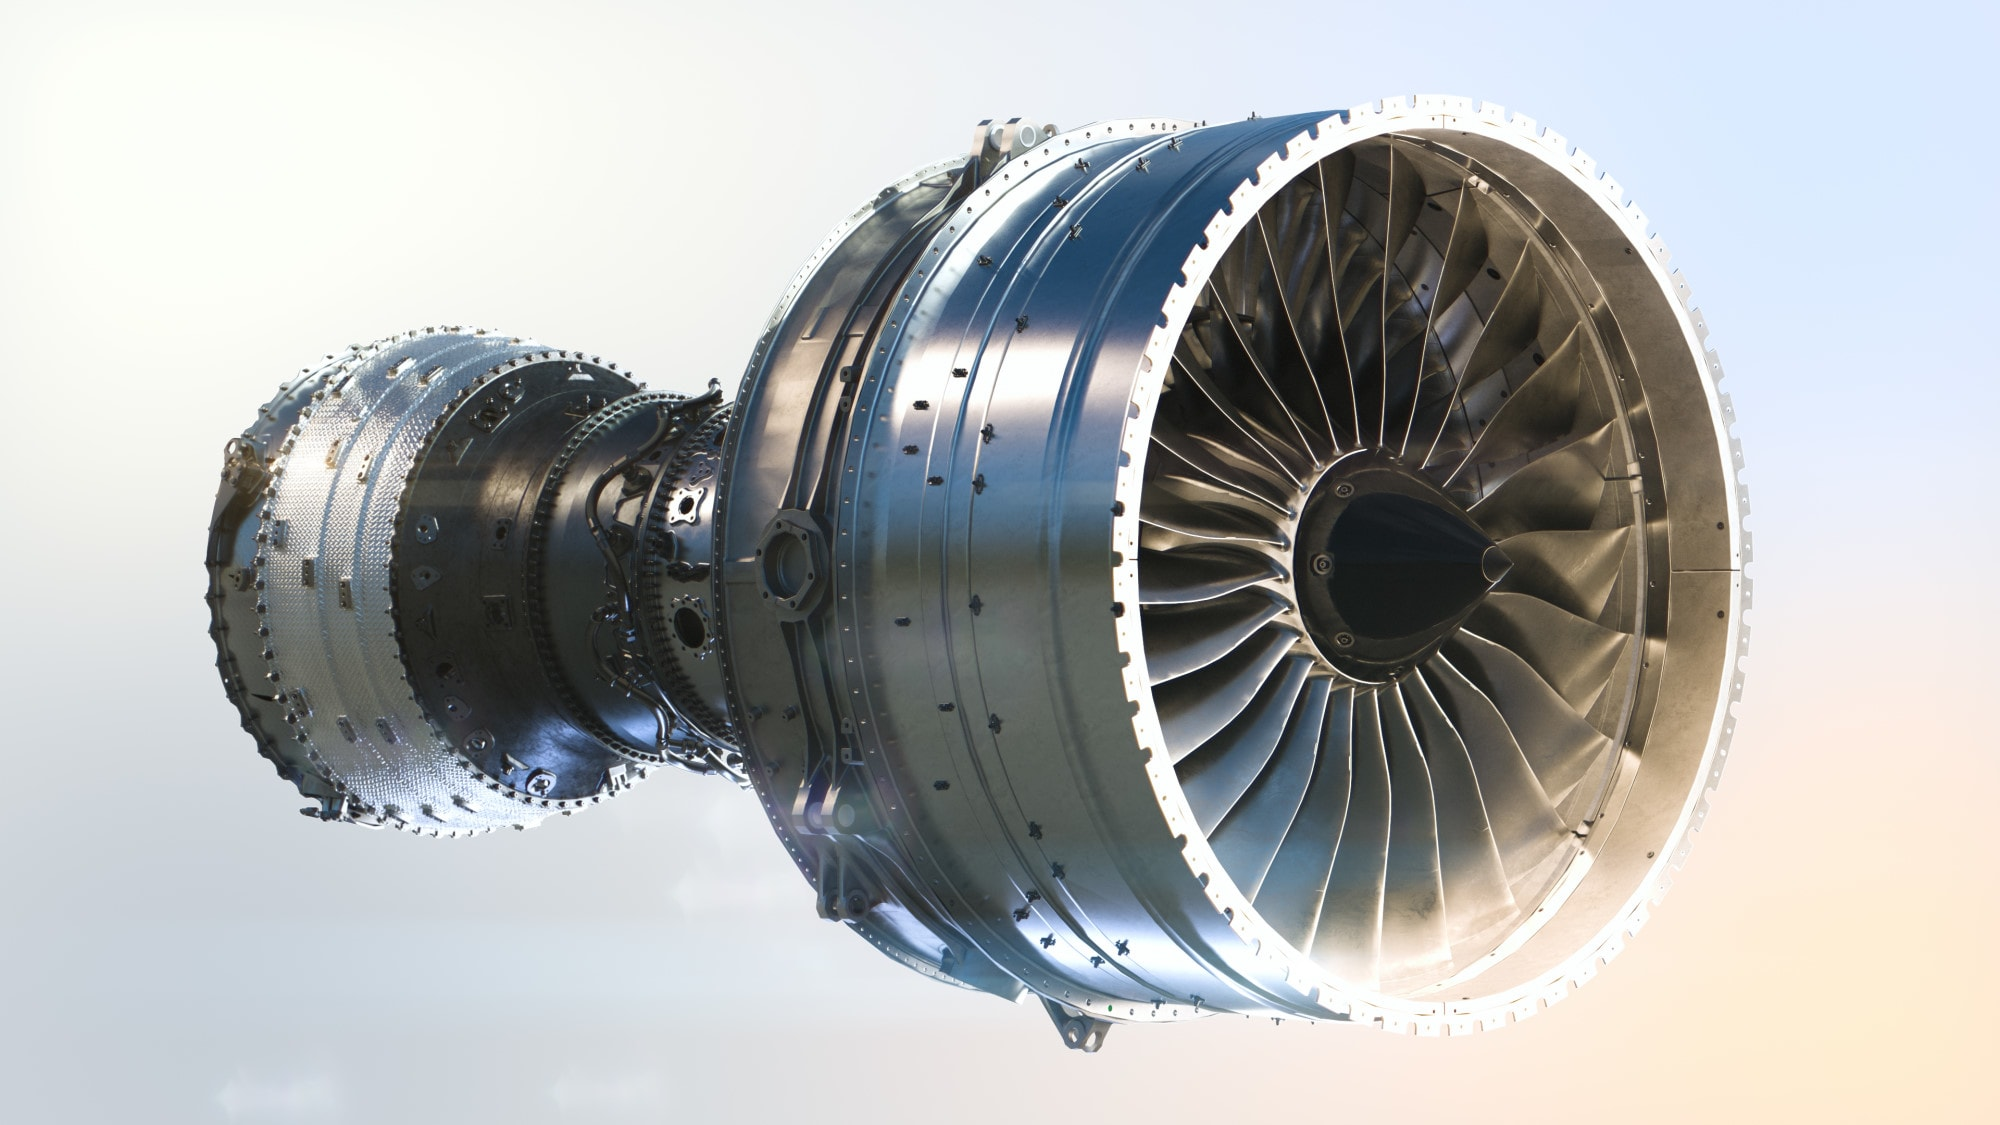 Rolls Royce Pearl 10X engine for Falcon 10X